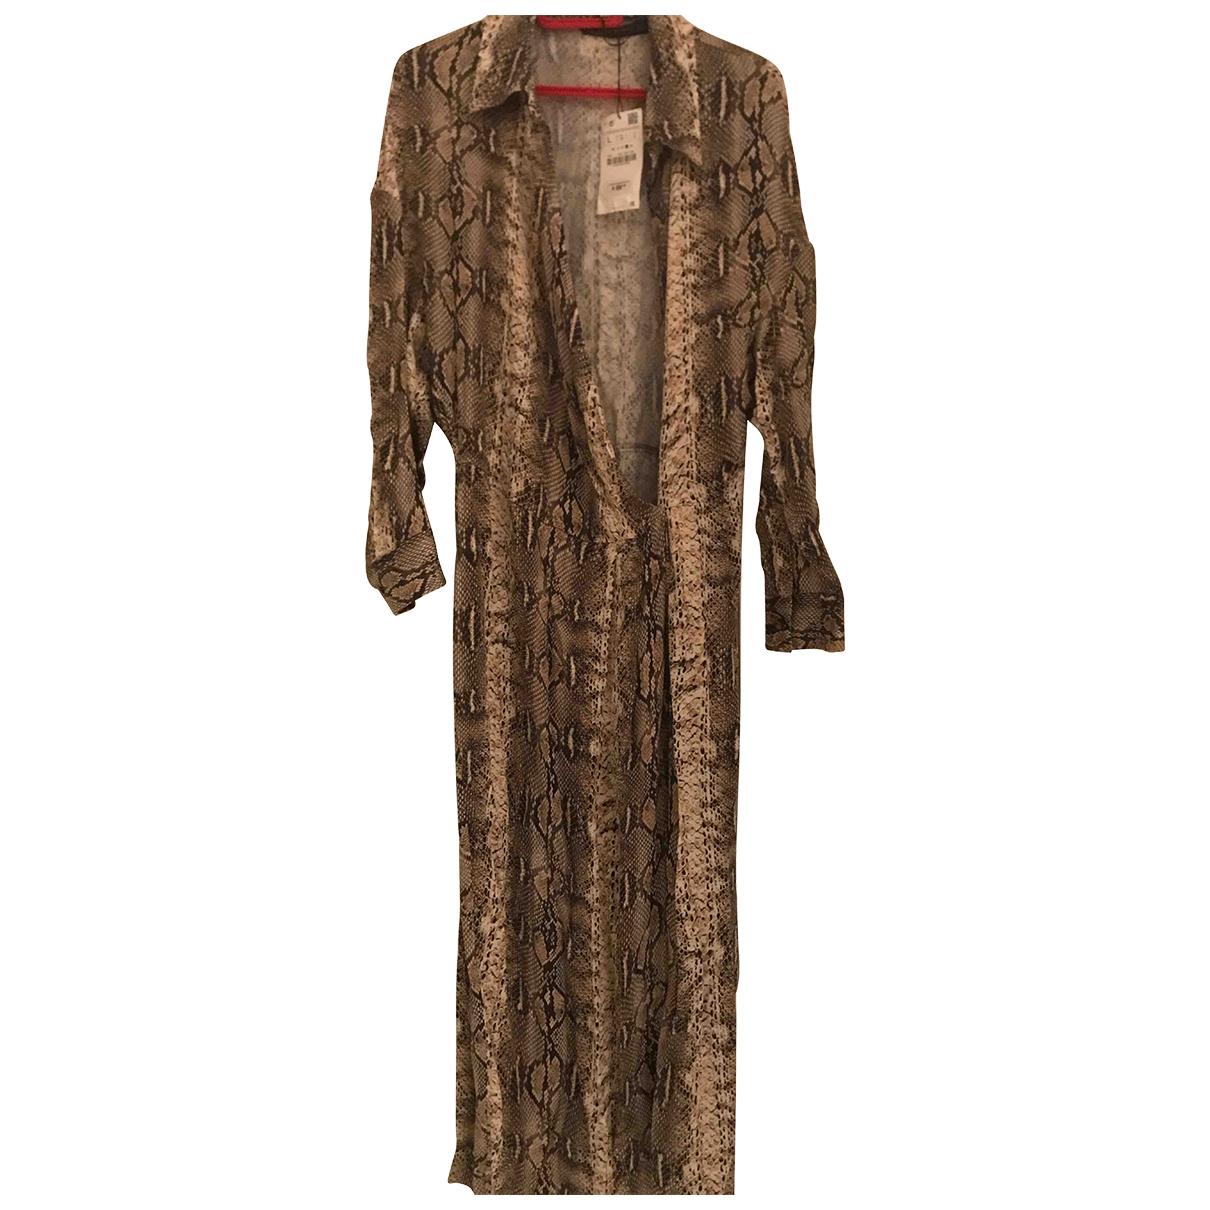 Zara \N dress for Women L International